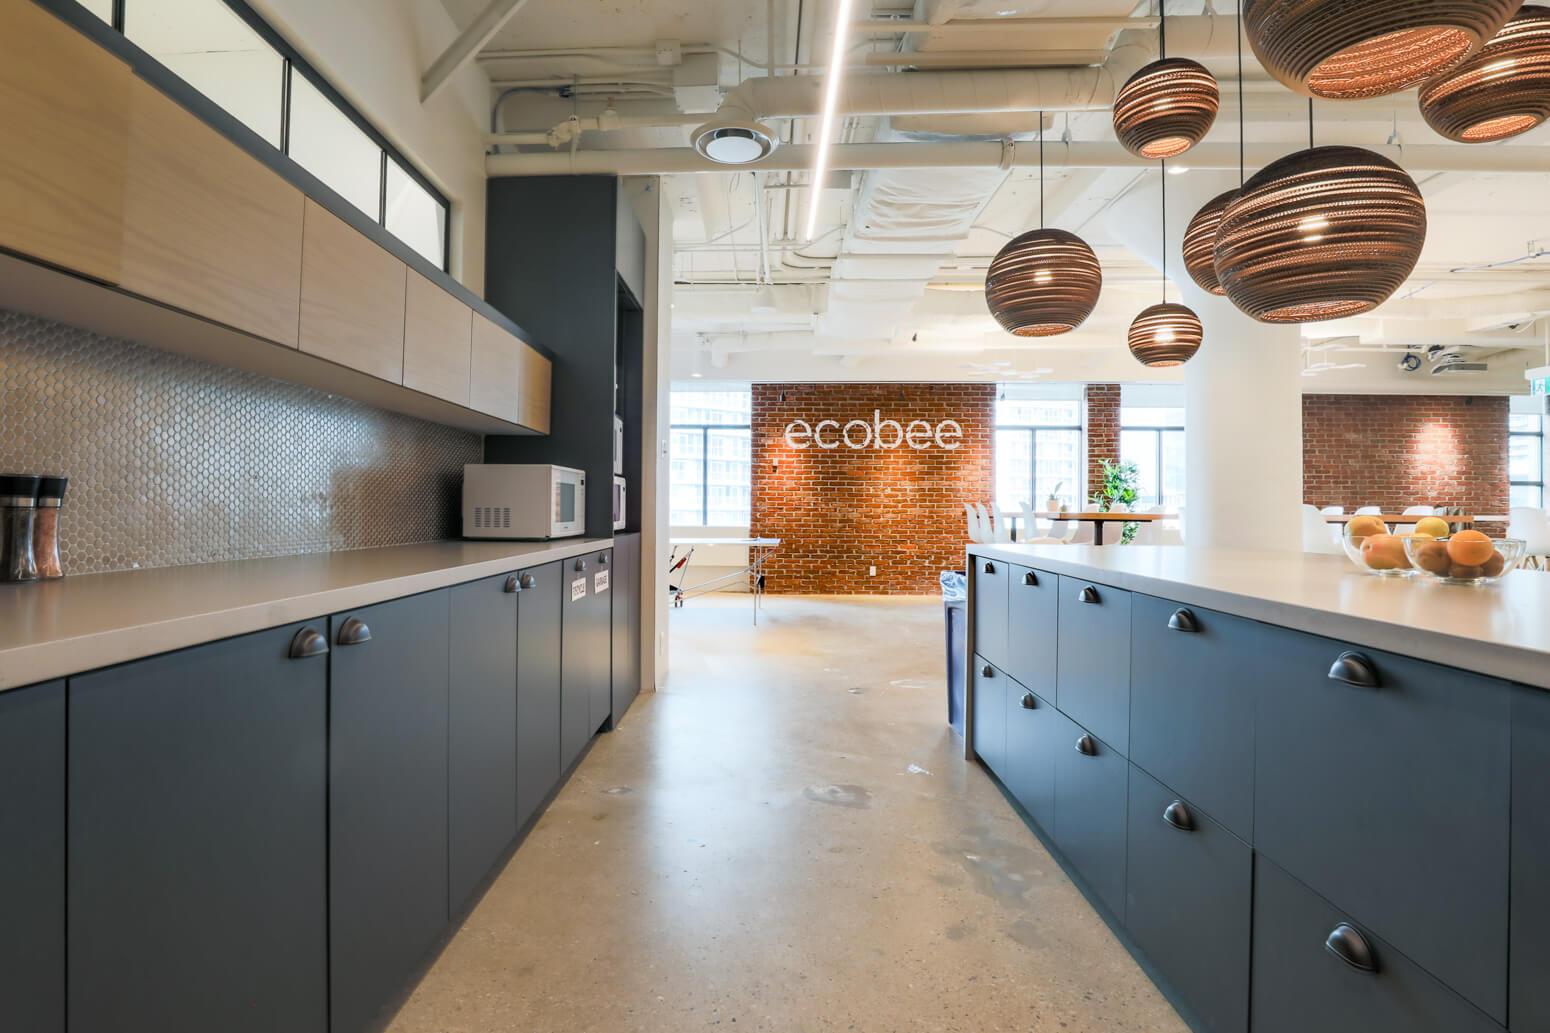 Ecobee Toronto Office Killer Spaces-28